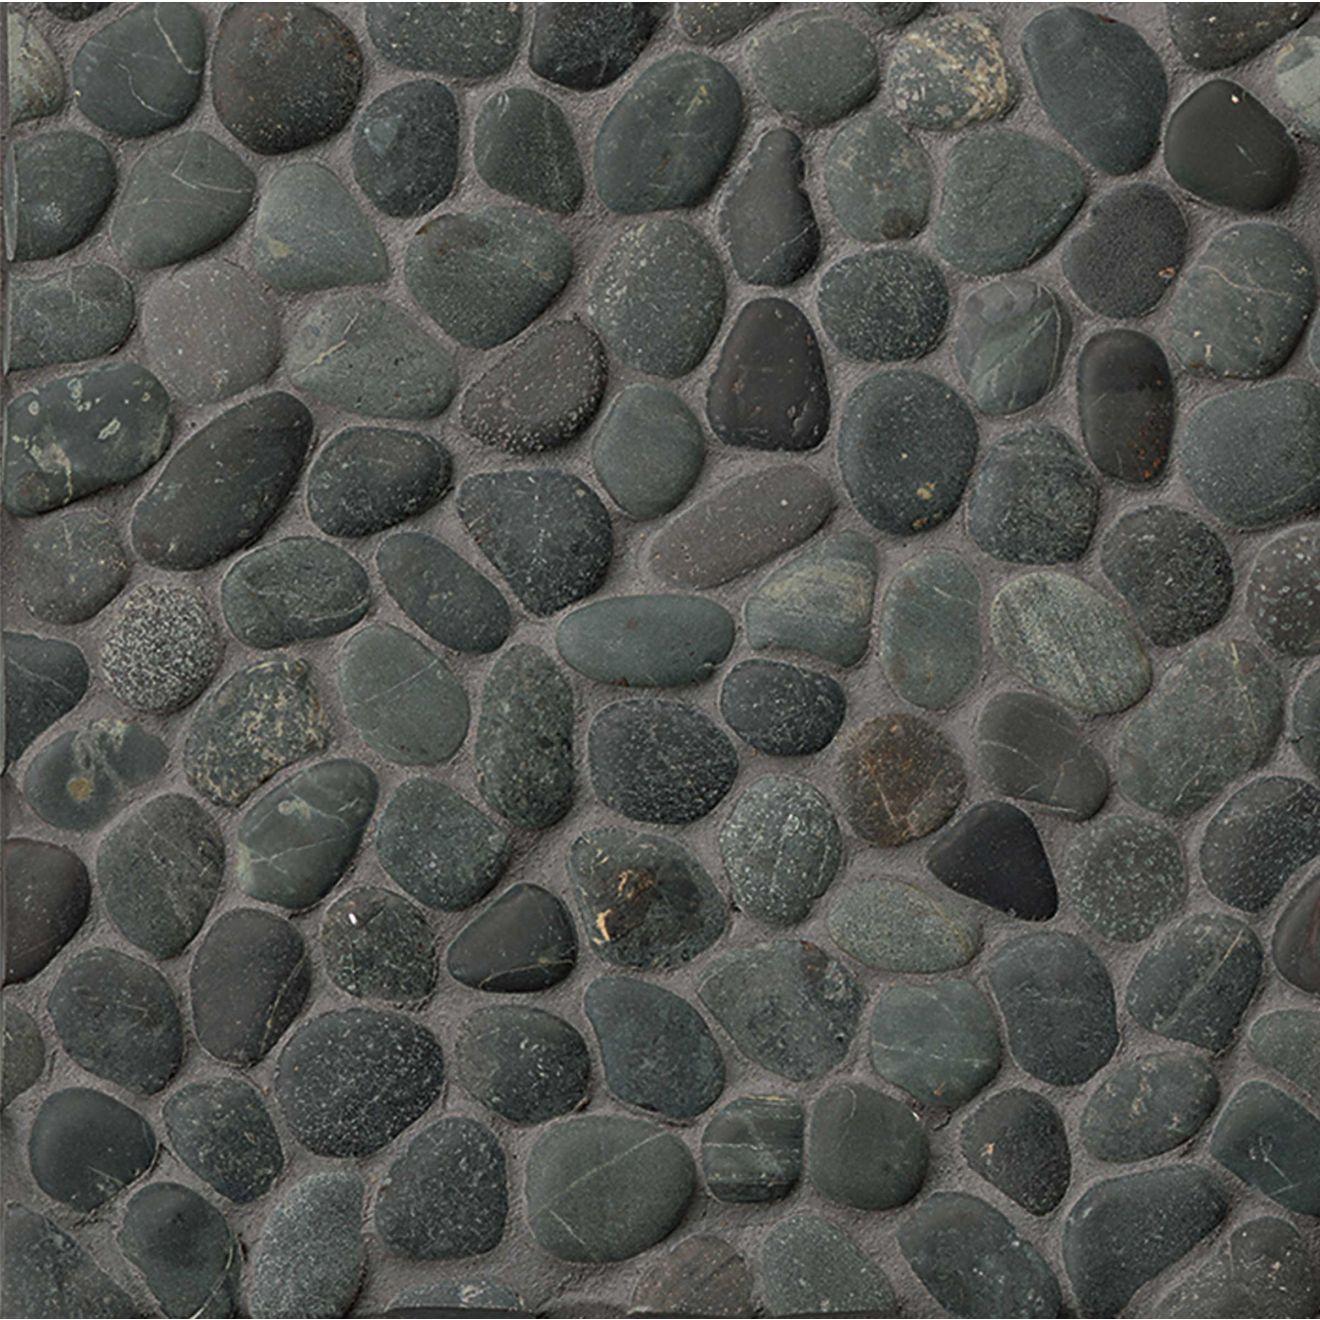 Hemisphere Unglazed Pebble Mosaic in Ocean Black